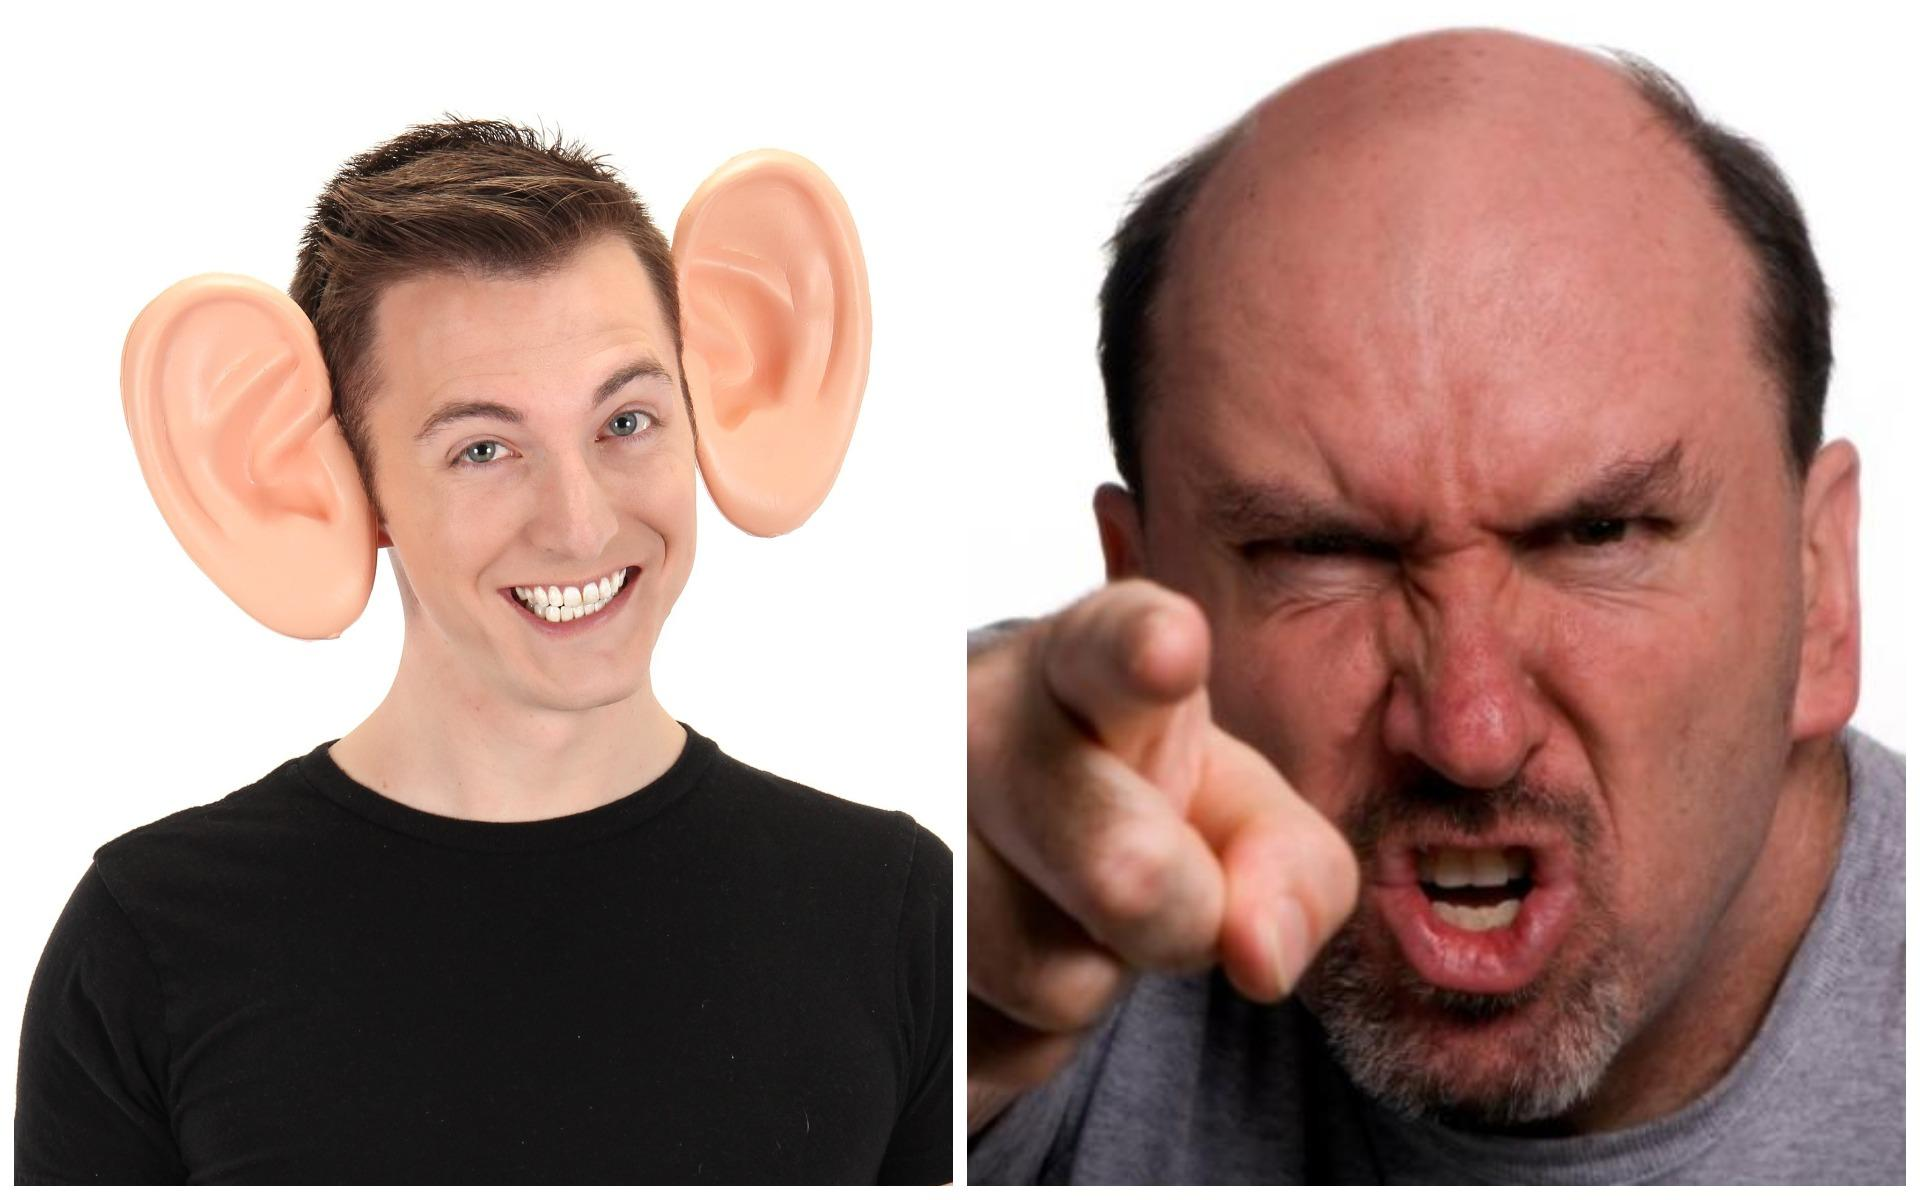 классические уши характер человека фото адрес